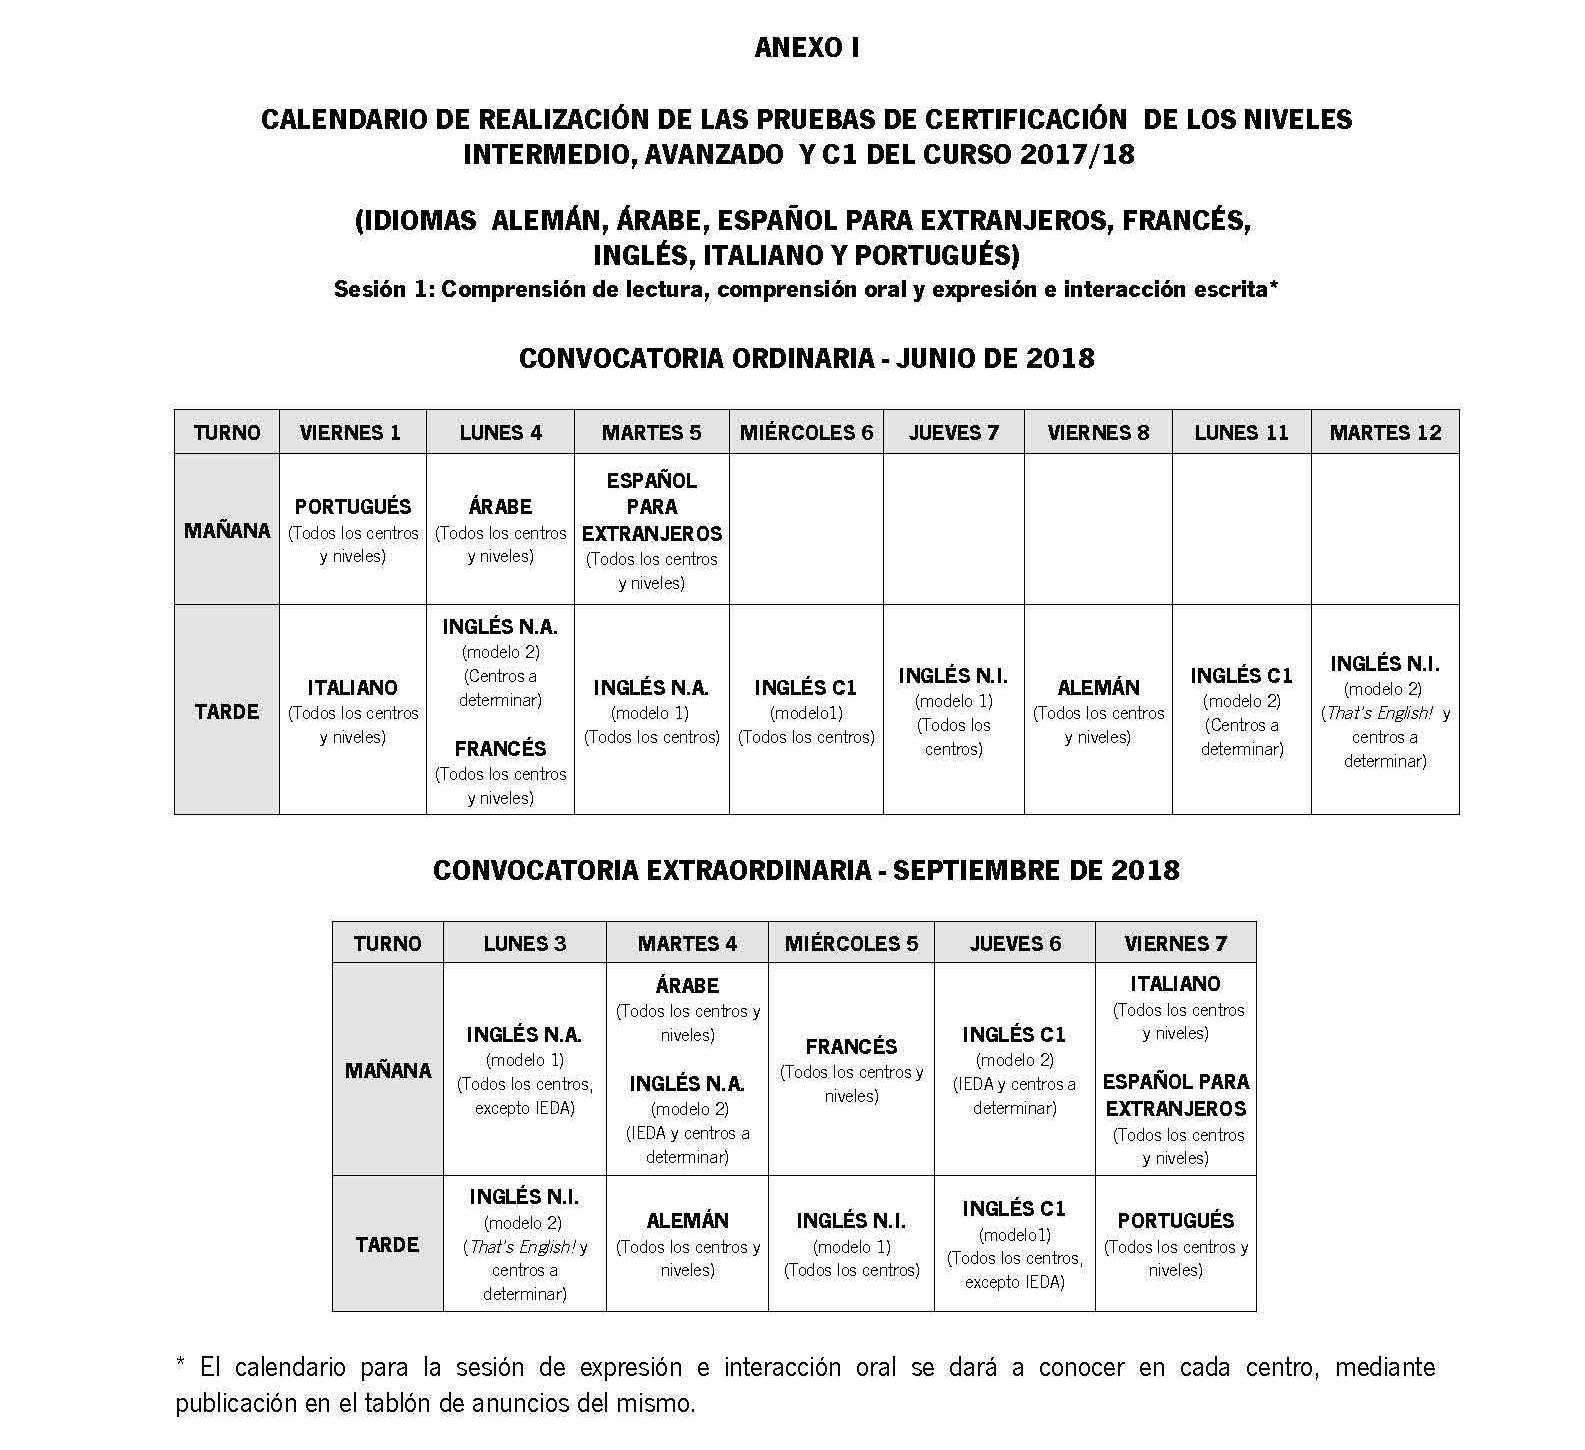 "Calendario Escolar 2019 Ceuta Más Arriba-a-fecha Calendario De Pruebas De Evaluaci""n Y De Certificaci""n Eoi Sevilla Of Calendario Escolar 2019 Ceuta Más Arriba-a-fecha I Pact Agenda Escolar De 2018 A 2019 Tama±o A5 Vista De Un Da"